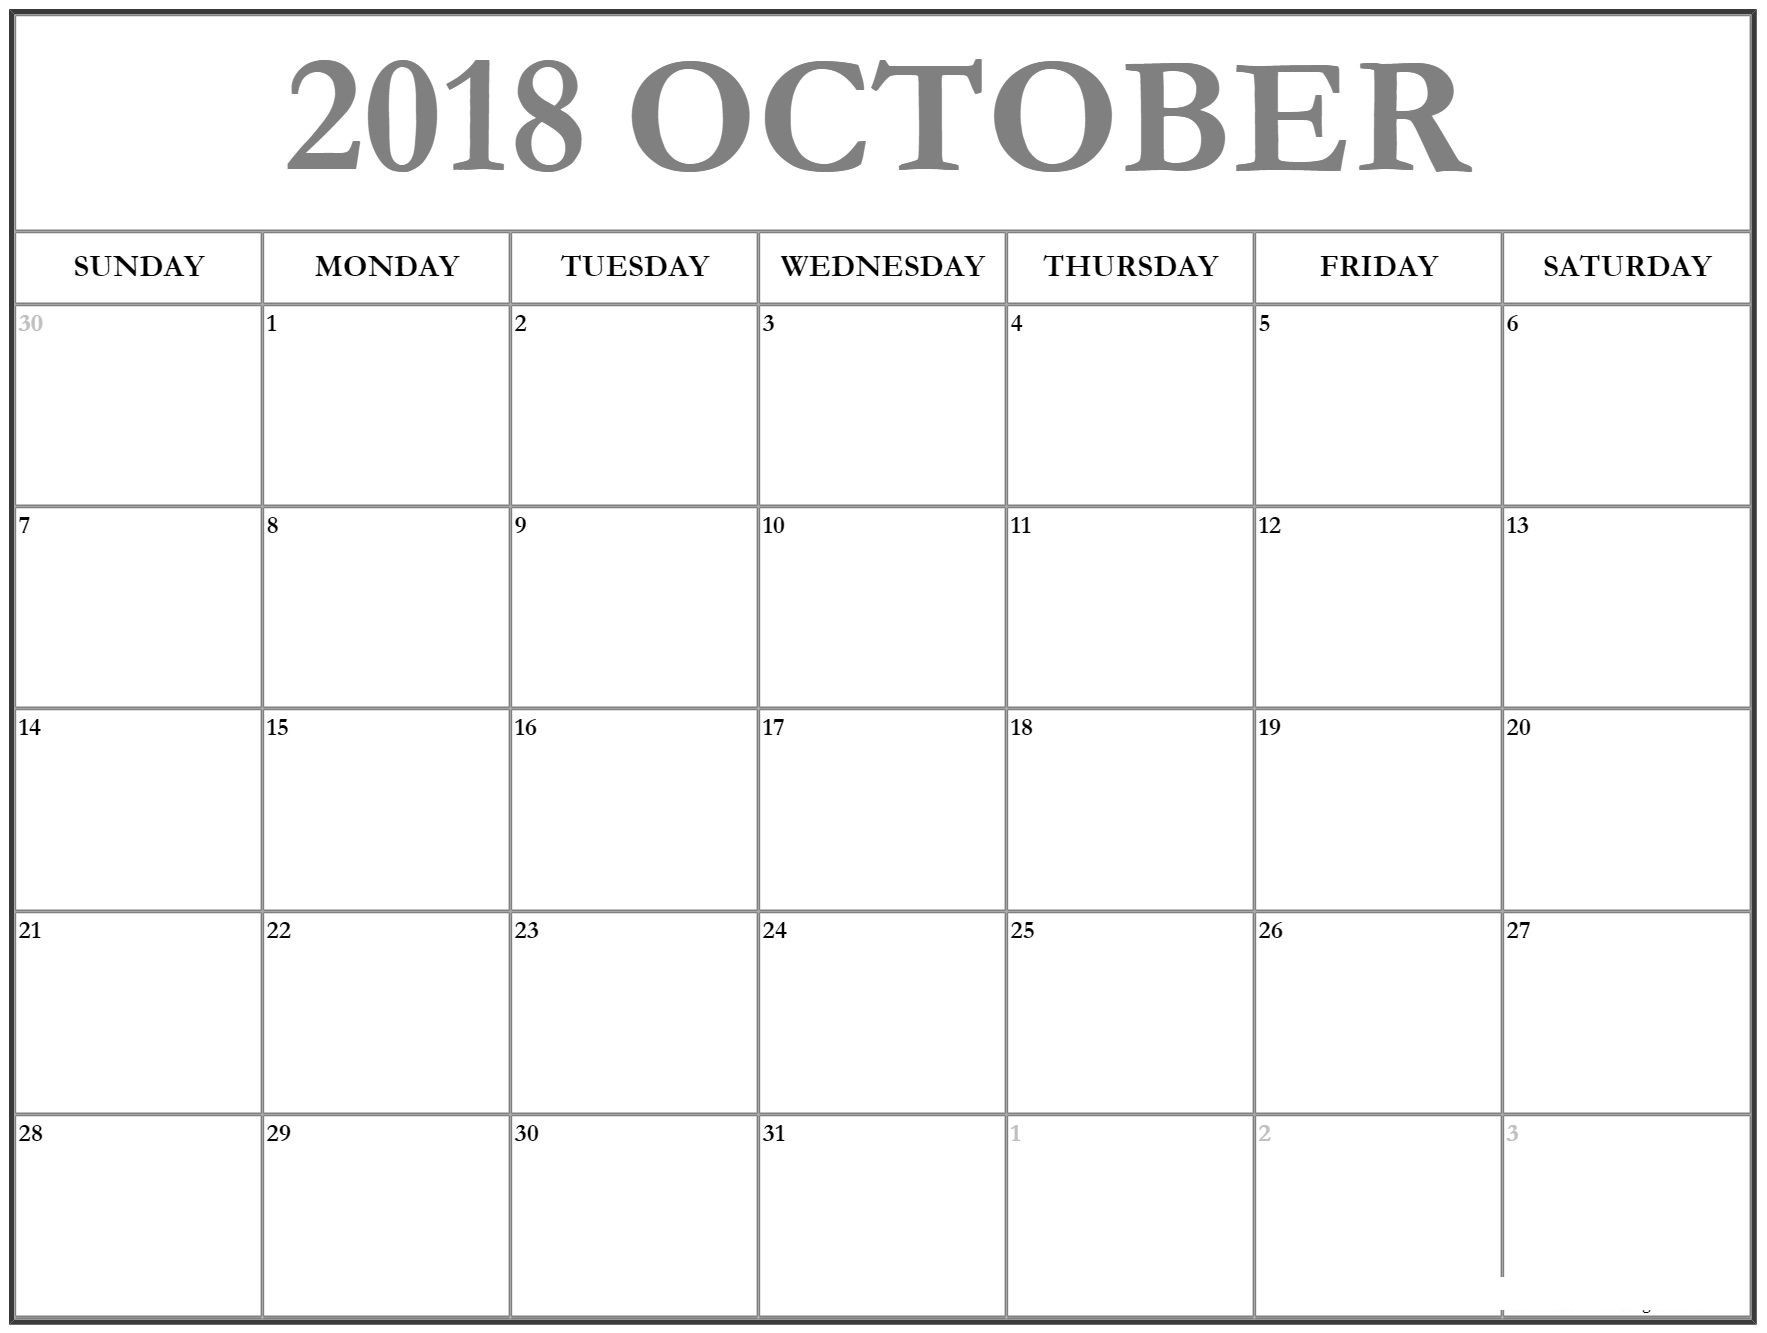 2018 October Time Table Calendar October 2018 Calendar